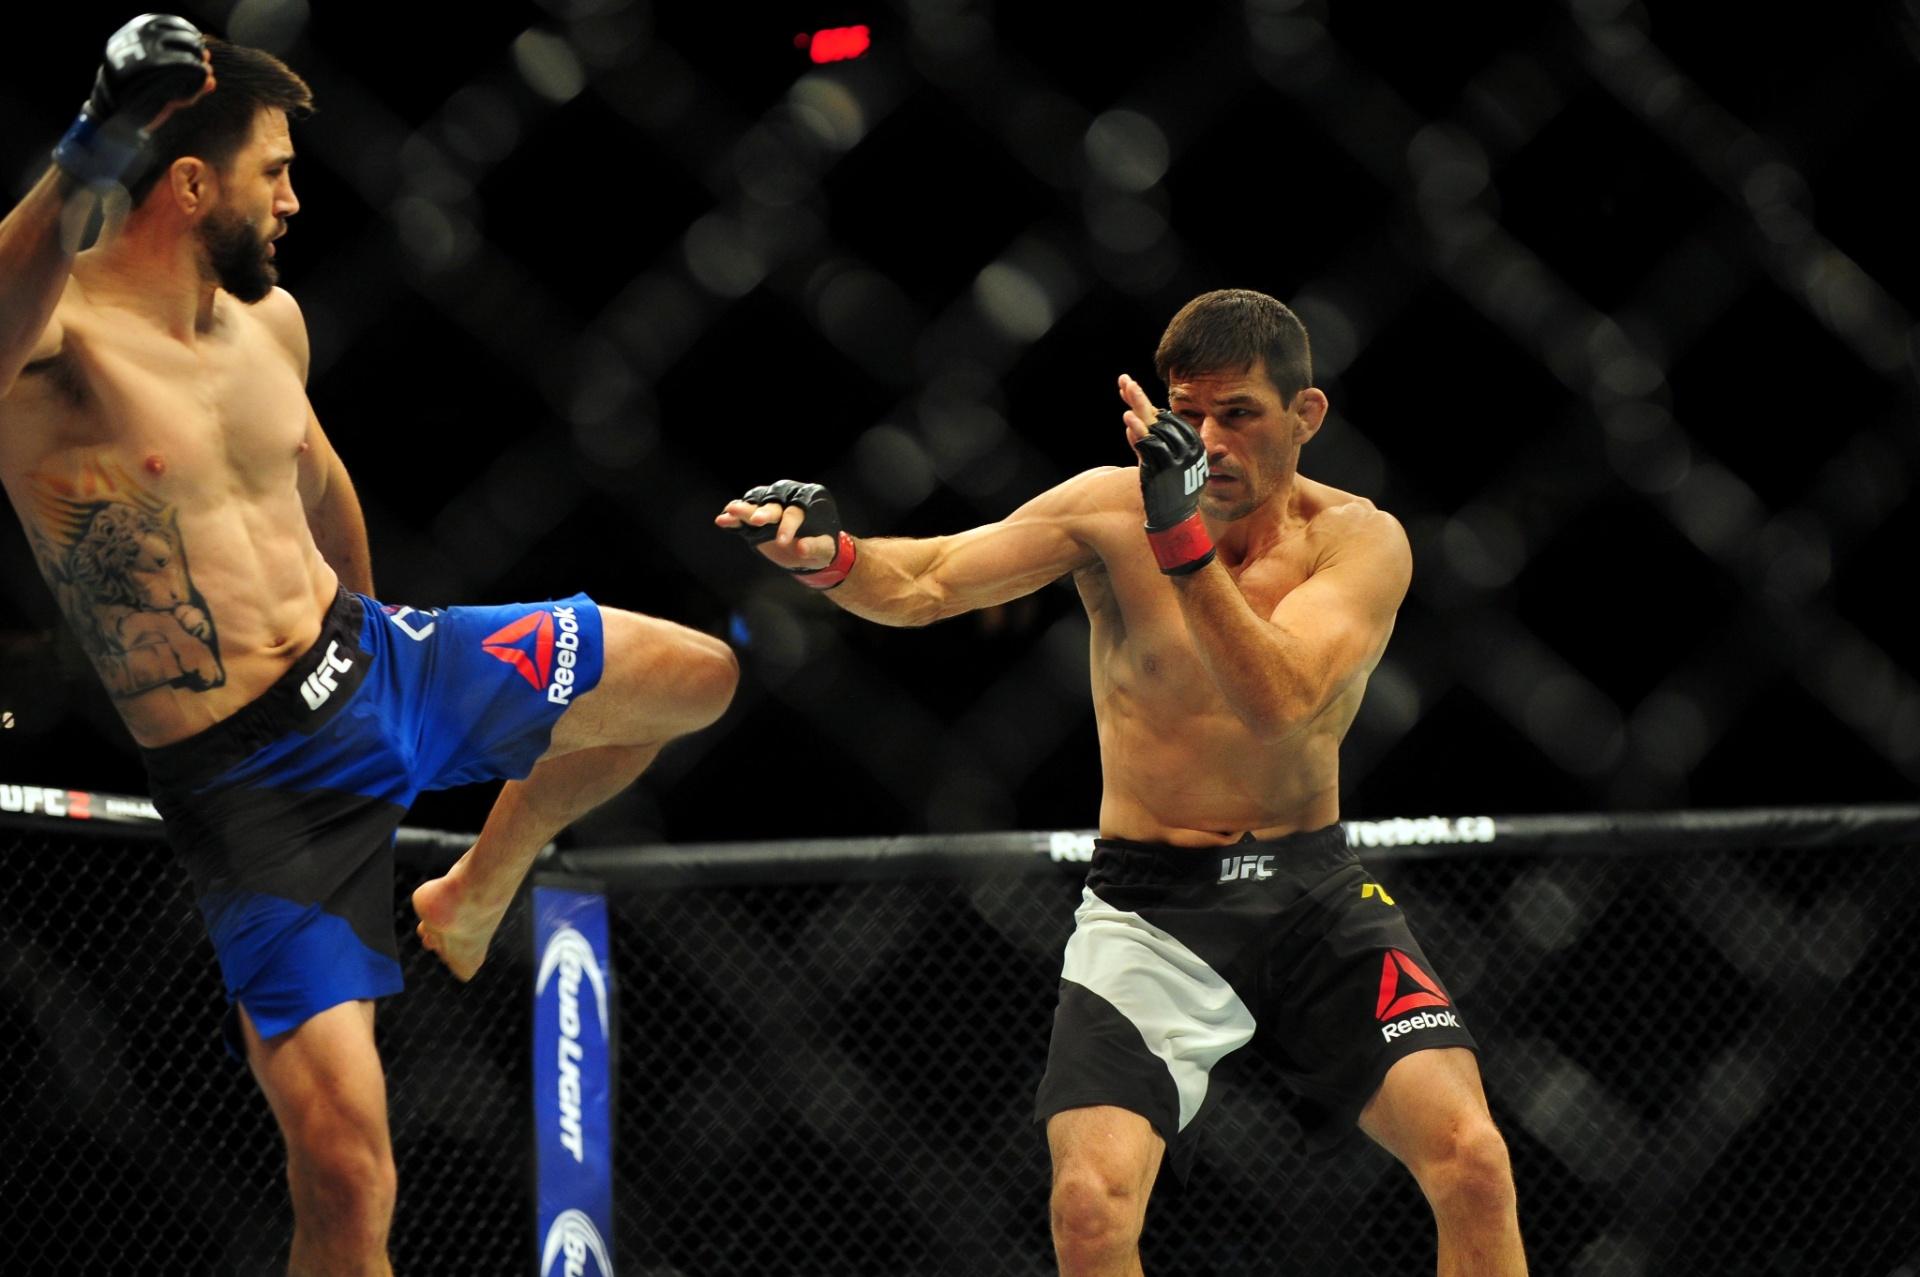 Demian Maia se defende de chute de Condit, durante luta no UFC Canadá